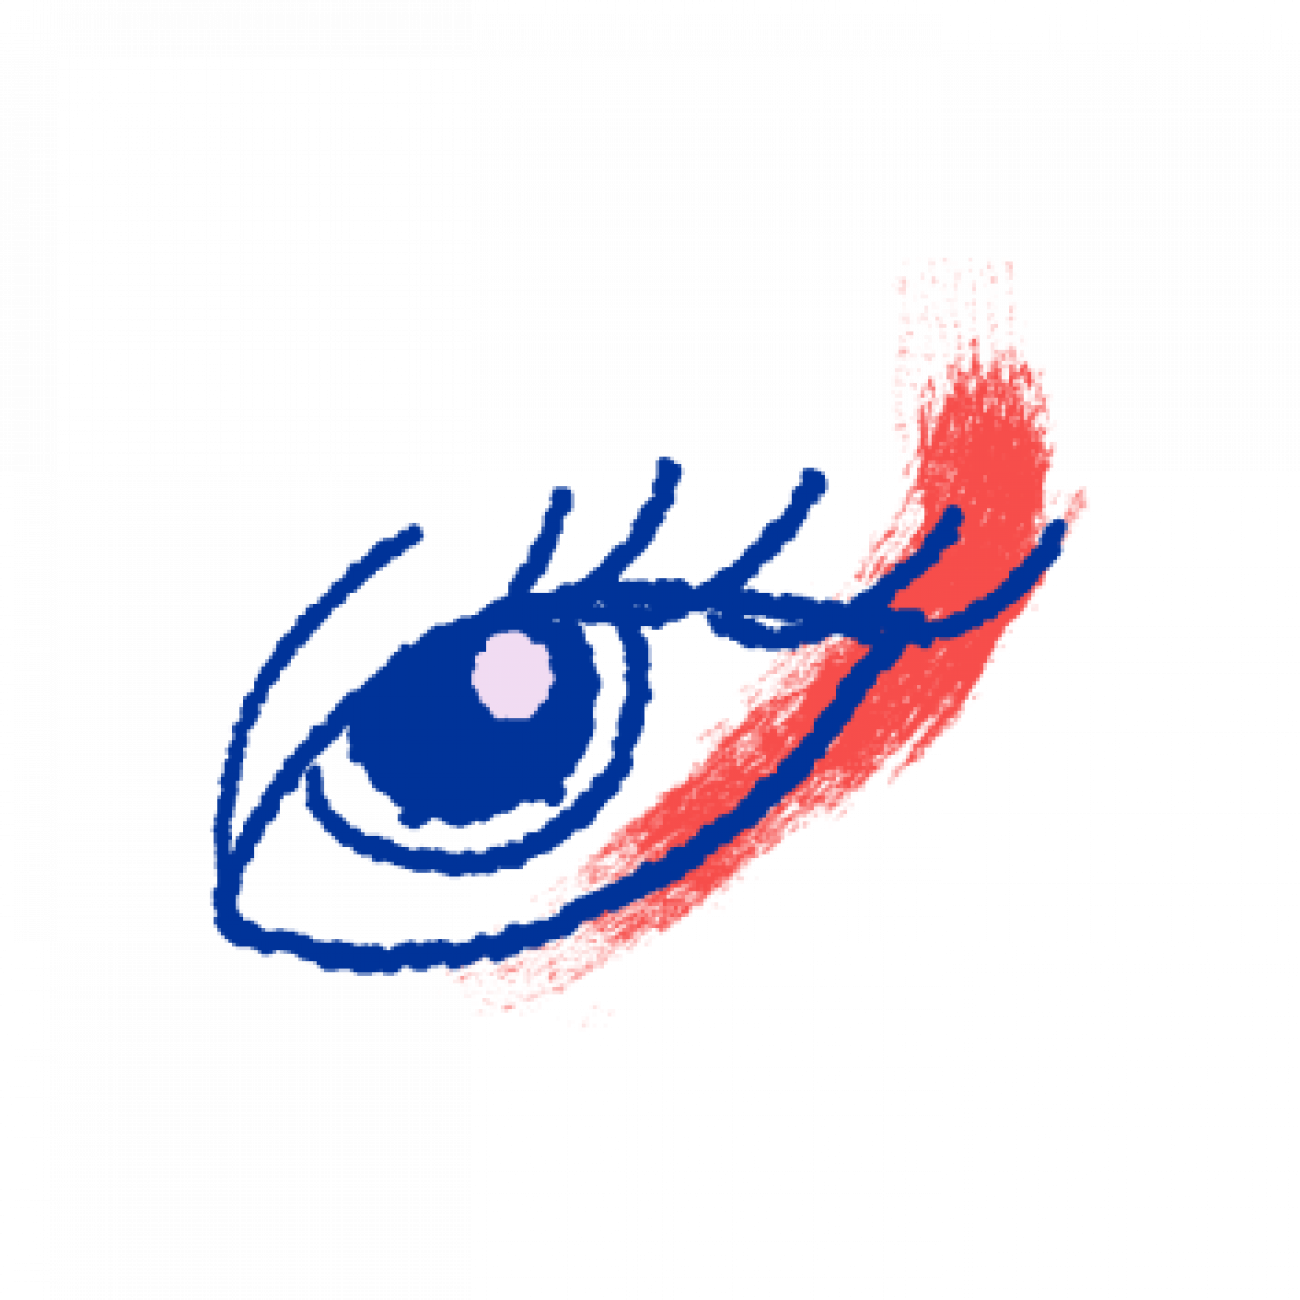 MOTIF_OEIL